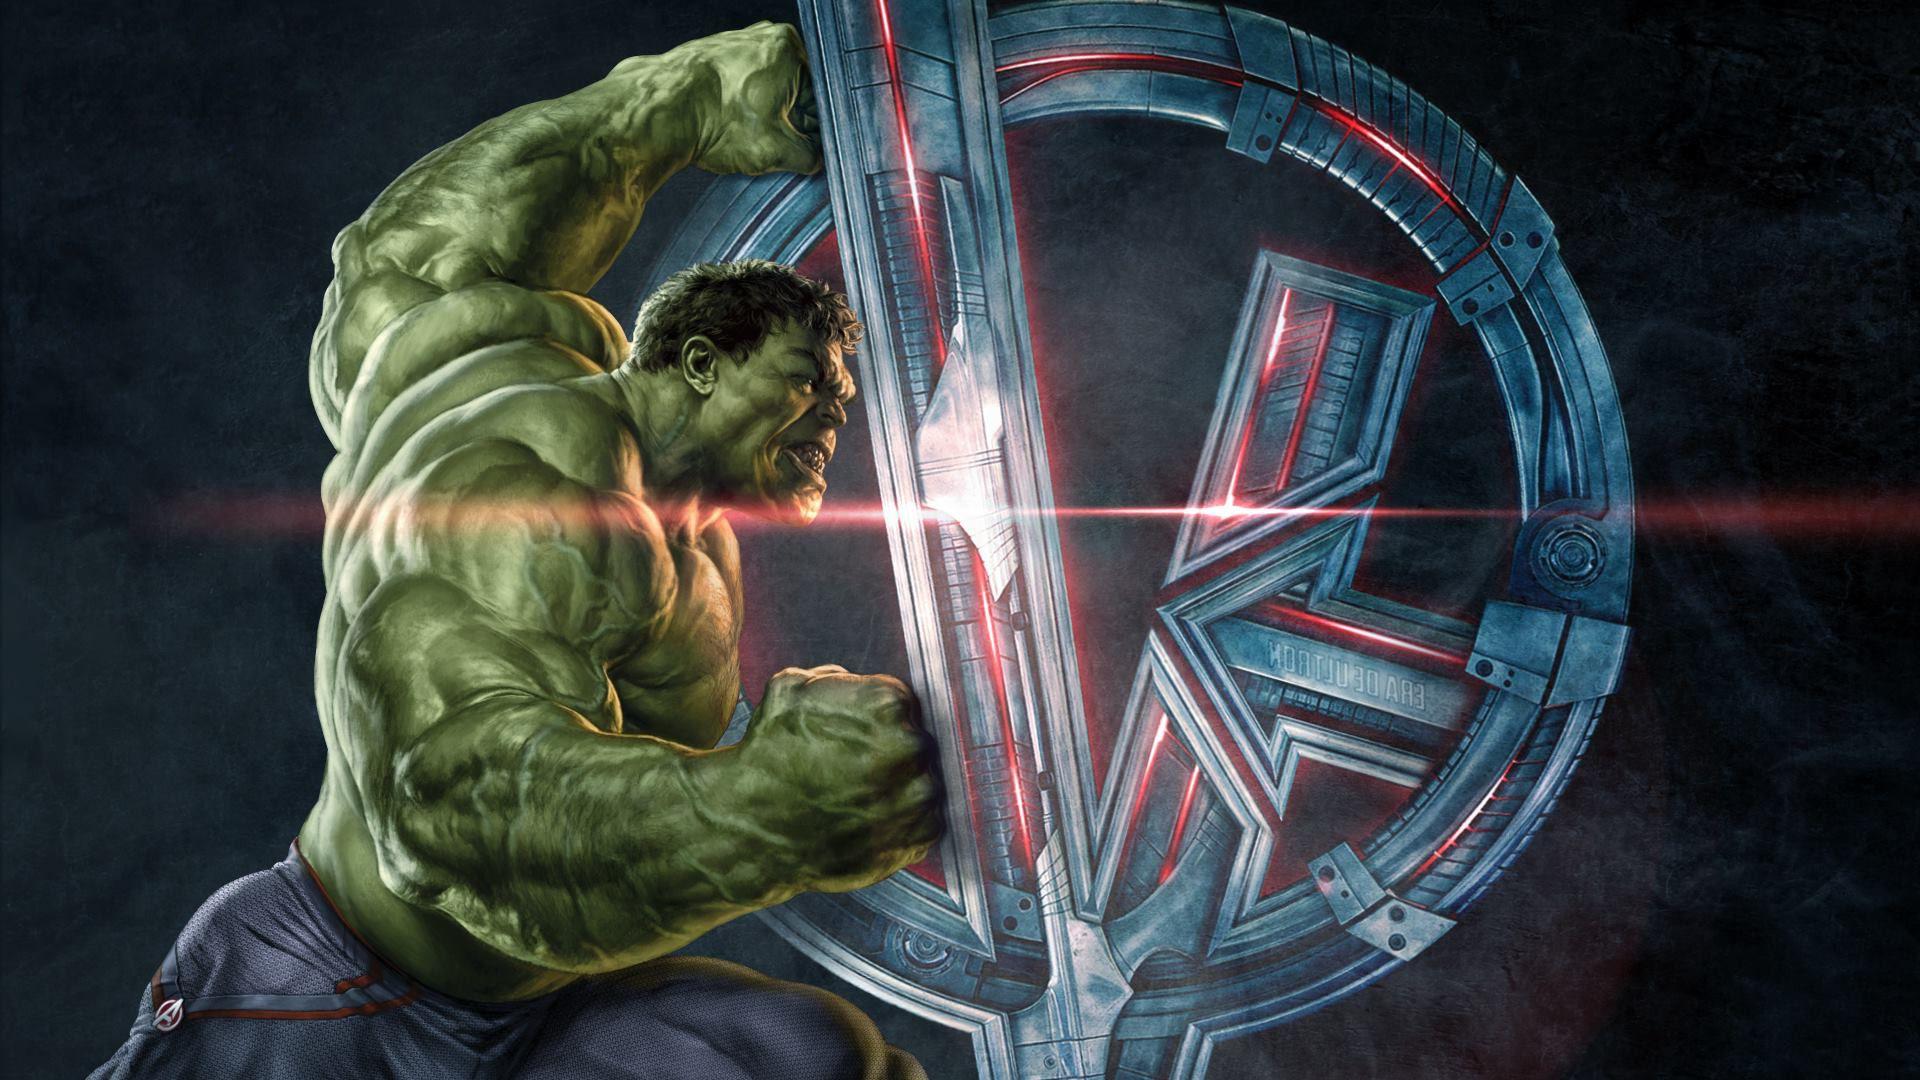 1920x1080 The Avengers Avengers Age Of Ultron Superhero Symbols